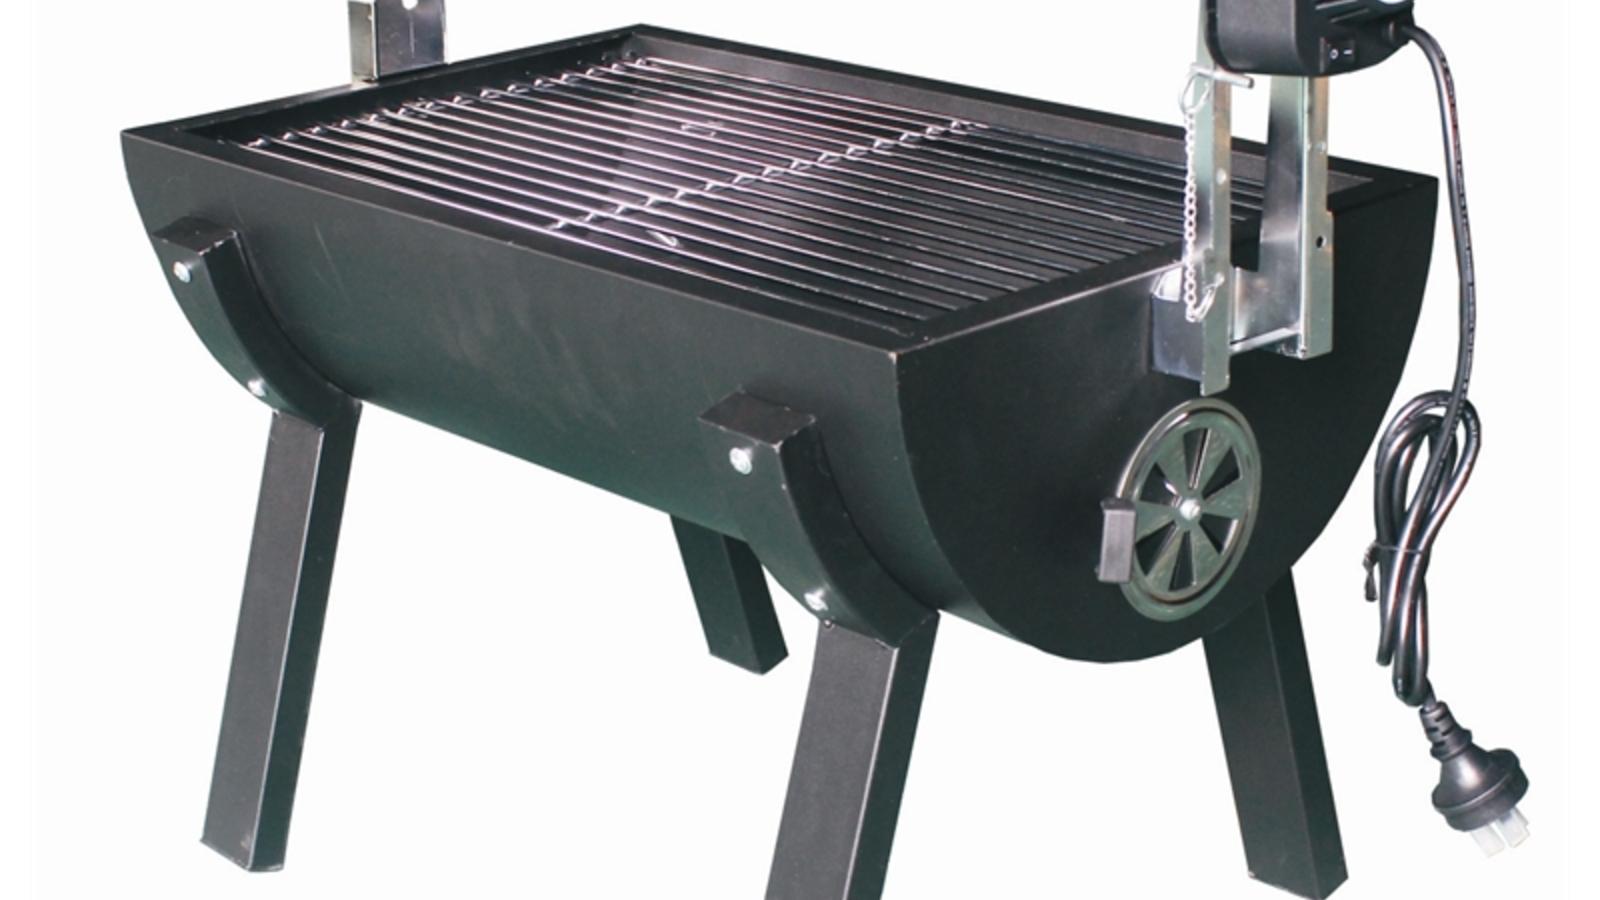 Spit roasting BBQ.